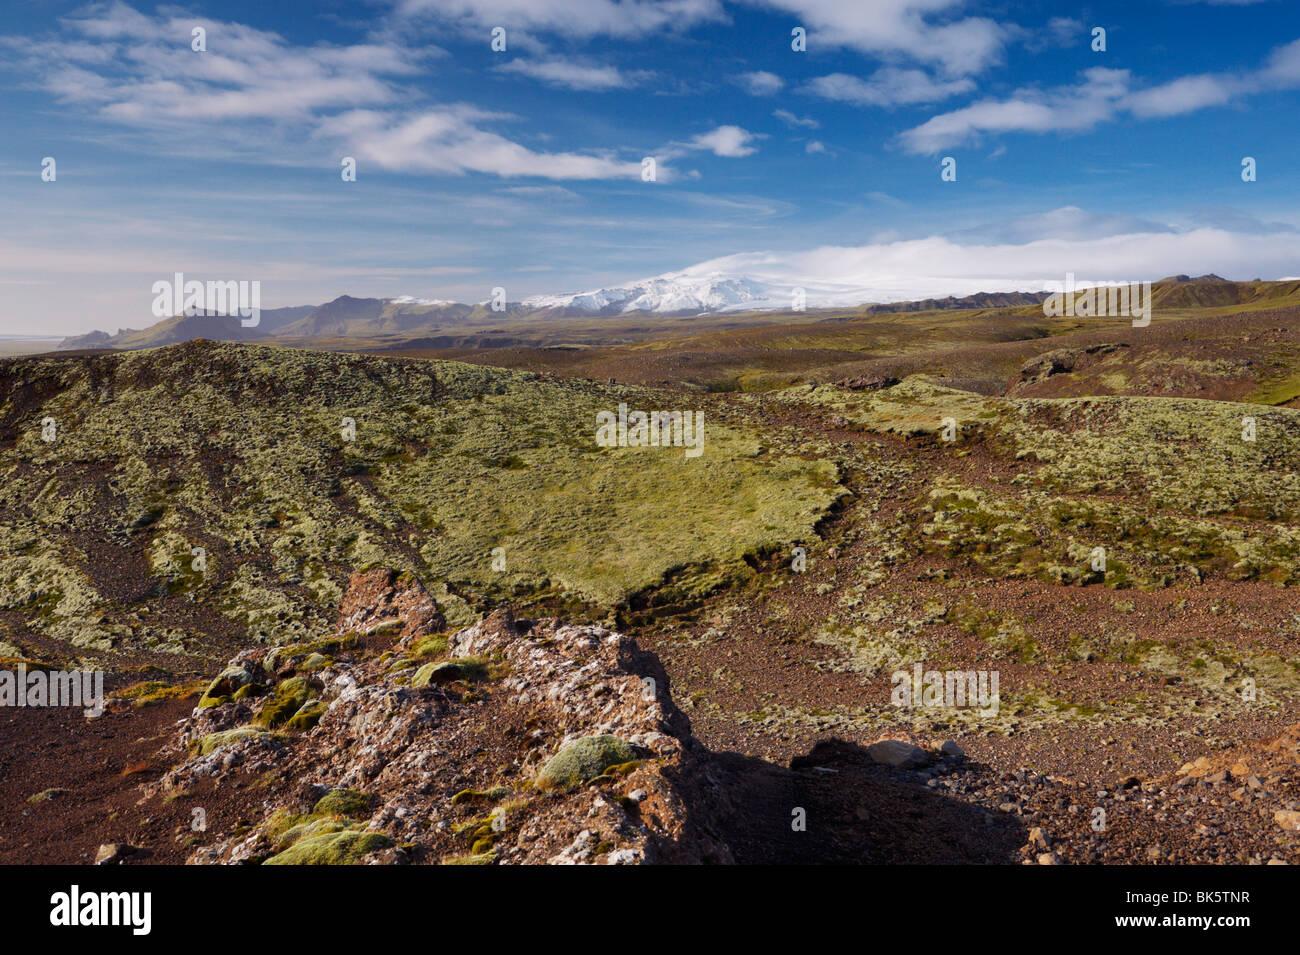 Lava fields, Myrdalsjokull glacier in the distance, near Vik, South Iceland, Iceland, Polar Regions - Stock Image